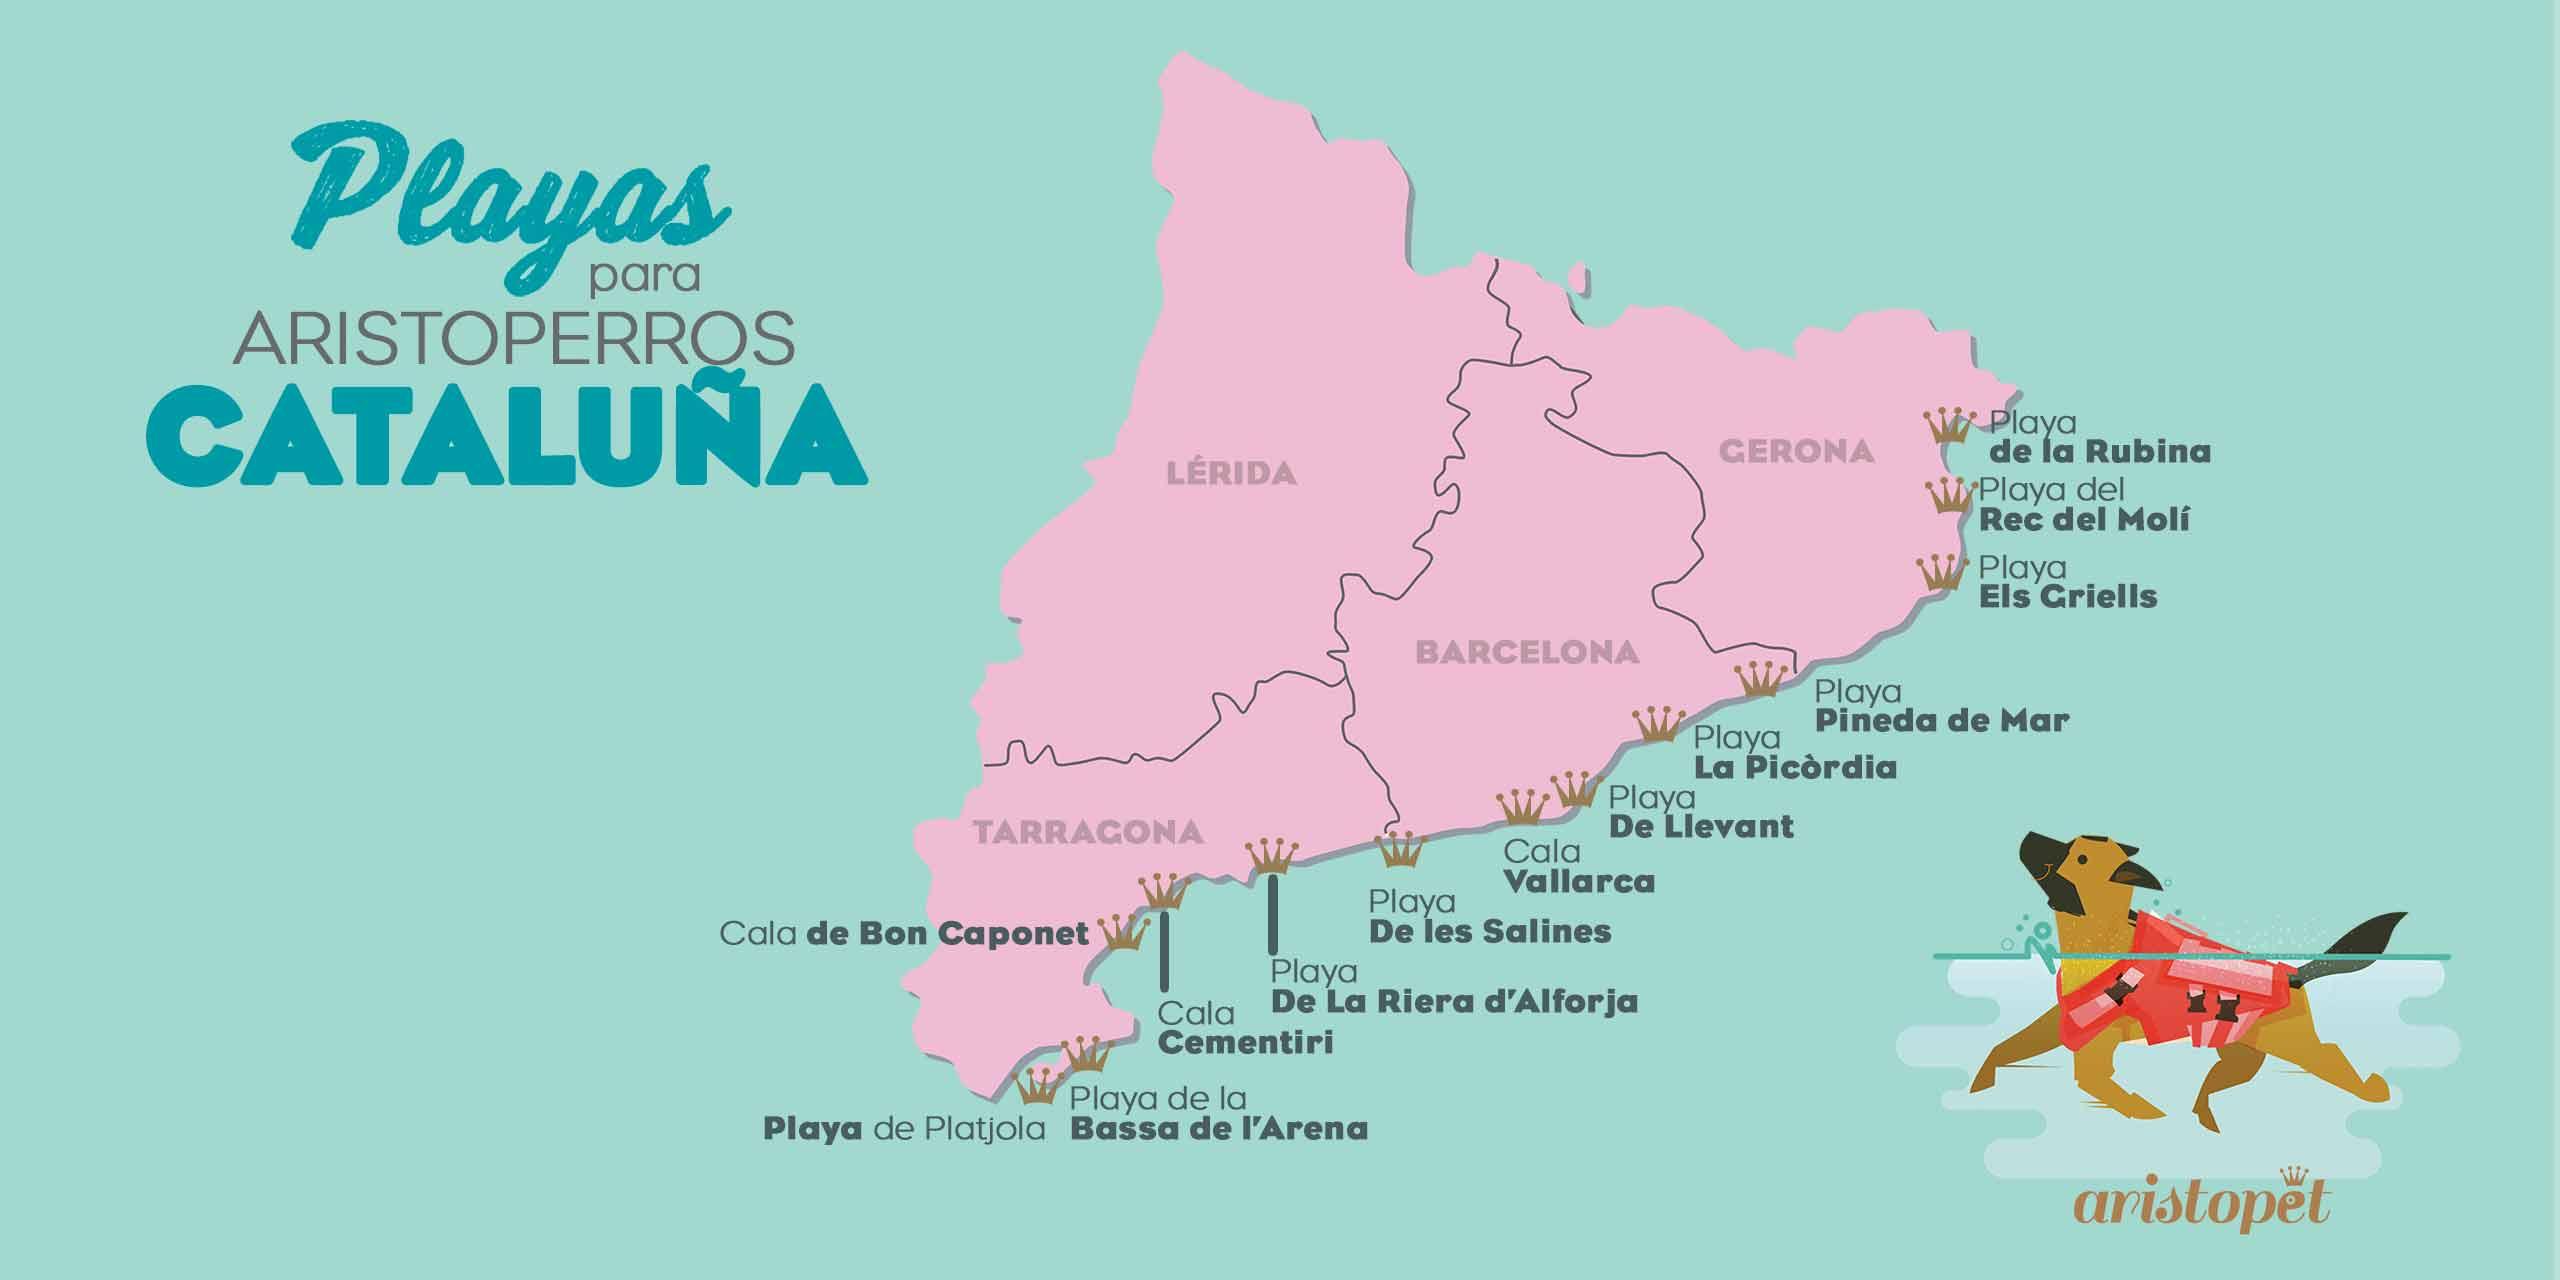 playas-de-cataluña-facebook